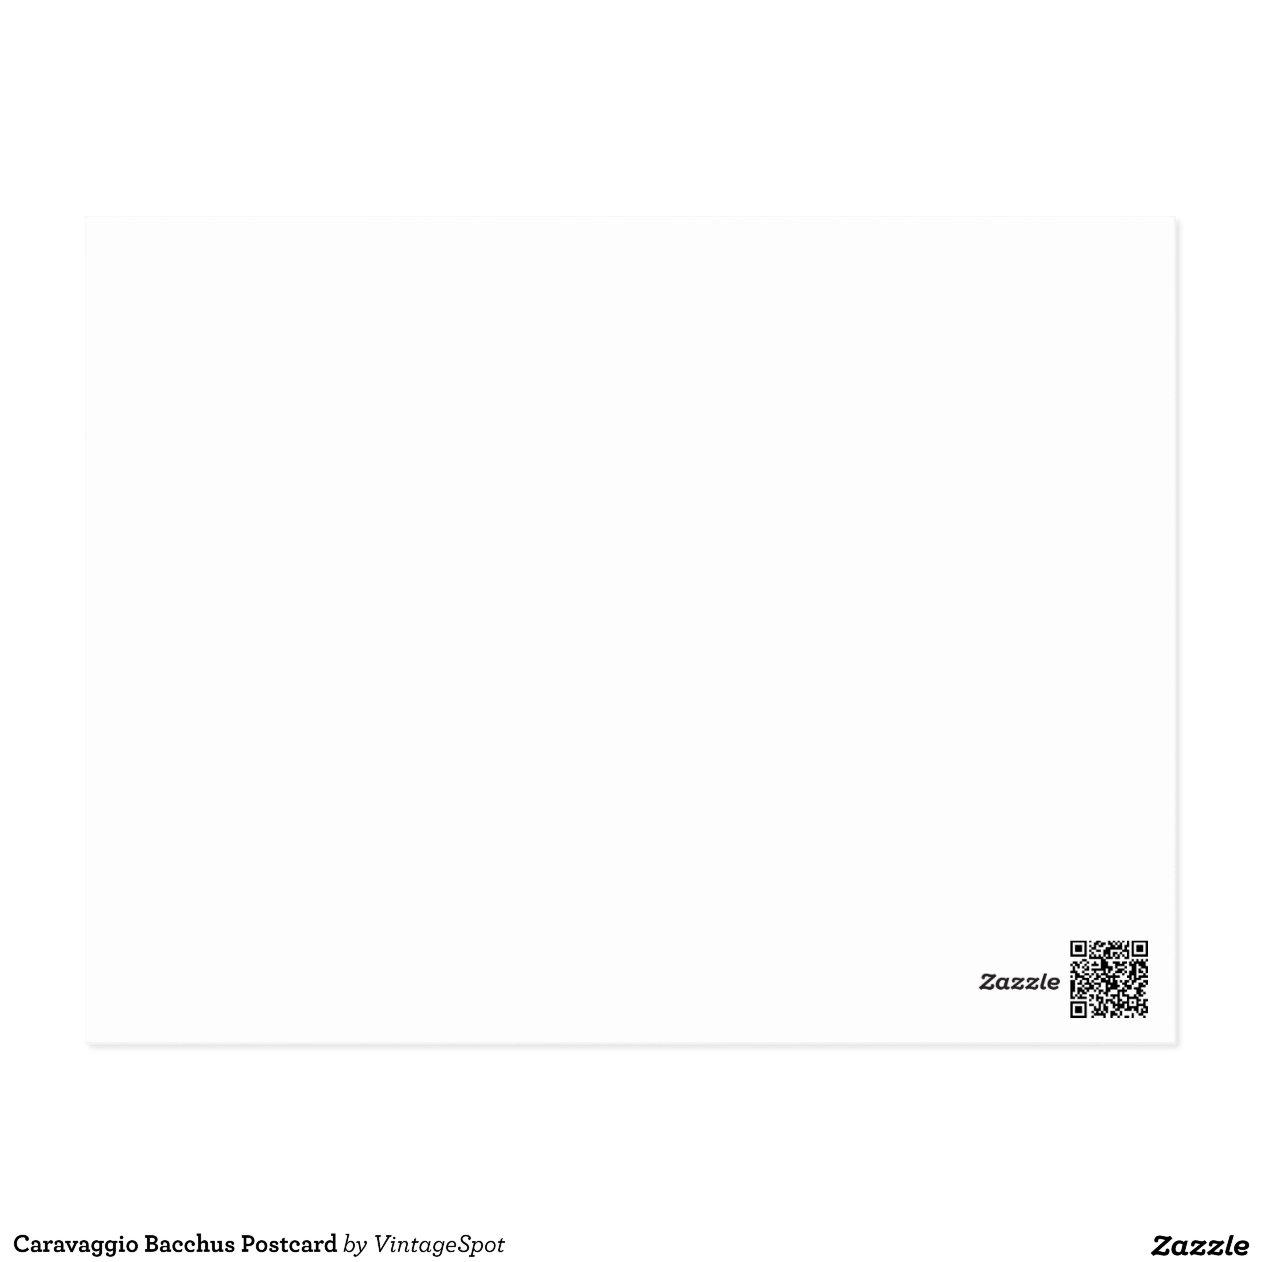 Young Sick Bacchus Caravaggio Bacchus Postcard